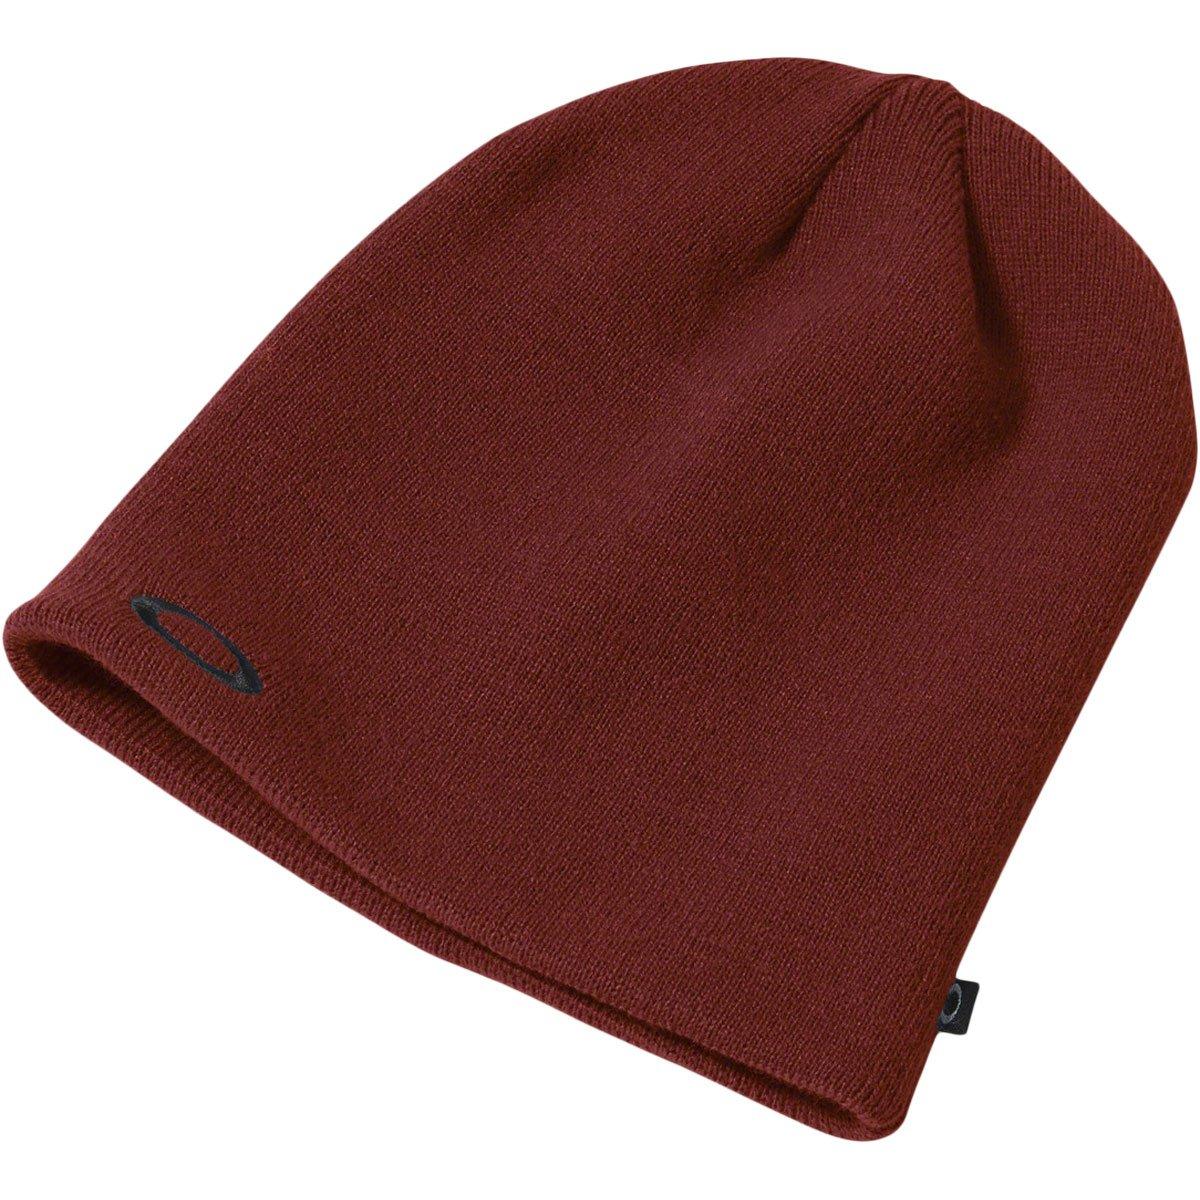 Oakley Fine Knit Beanie, Iron Red, One Size